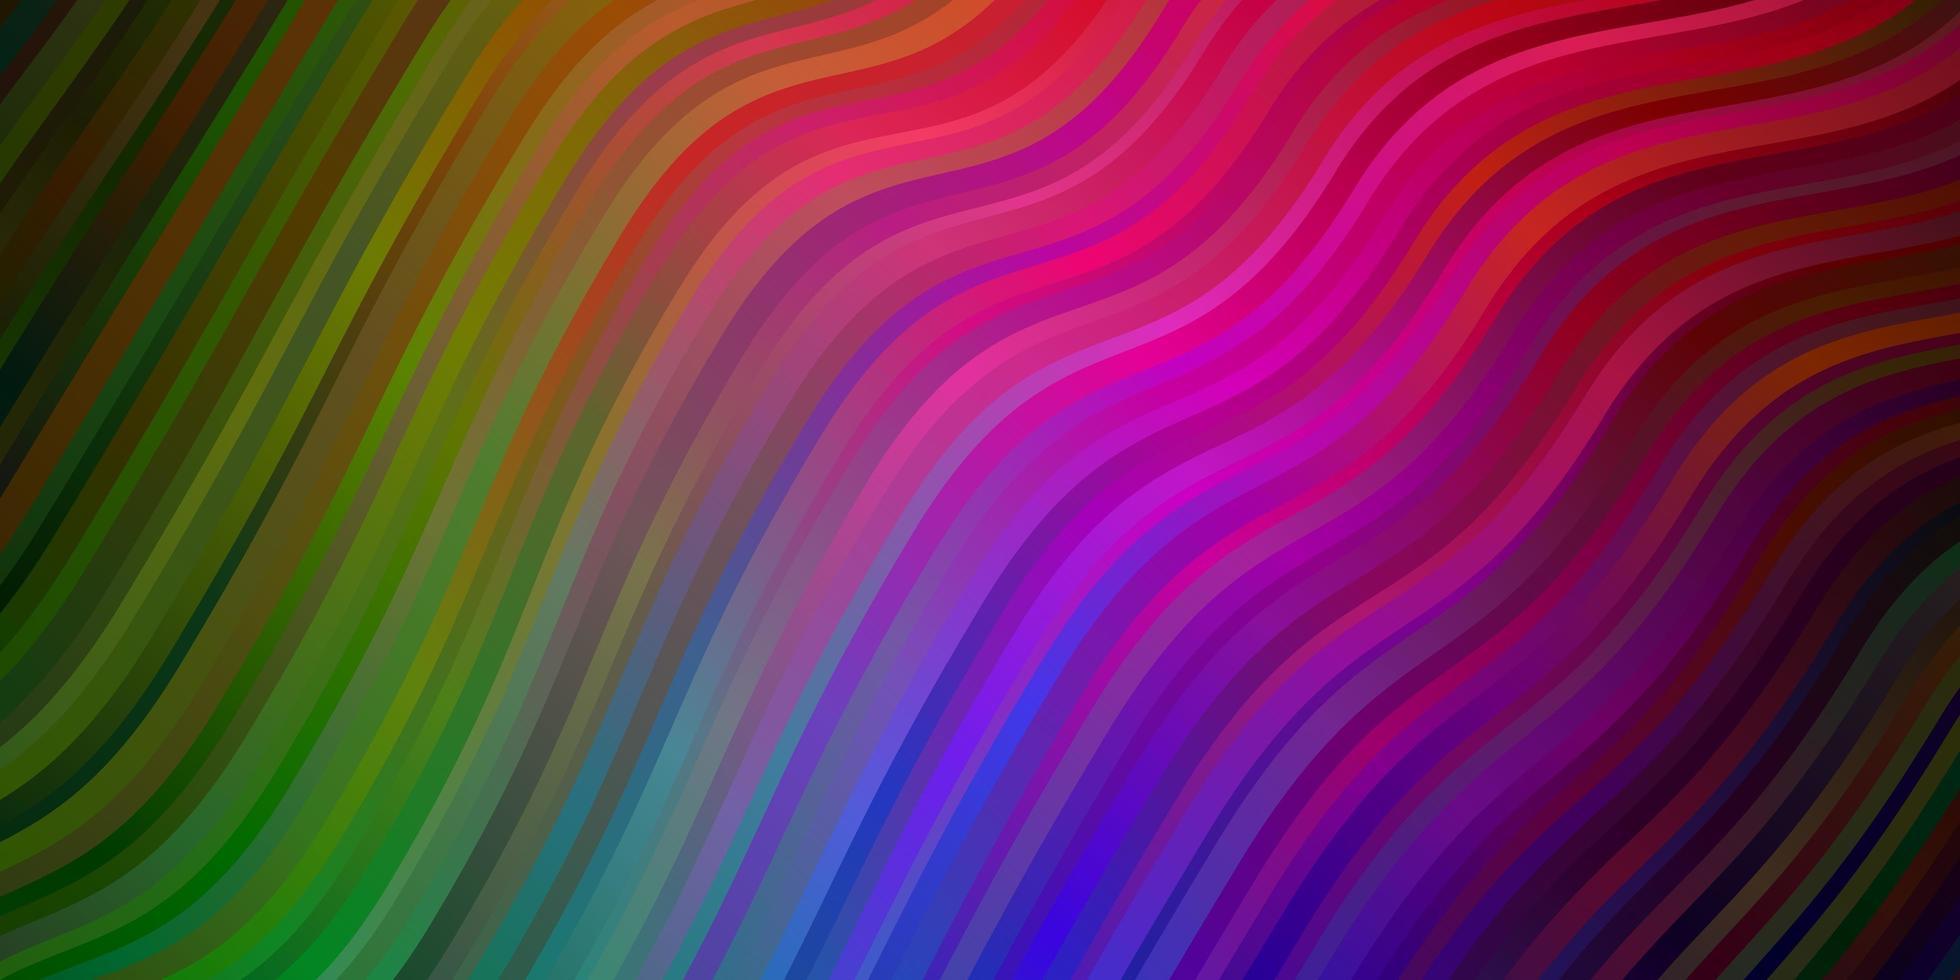 fundo multicolor com curvas. vetor